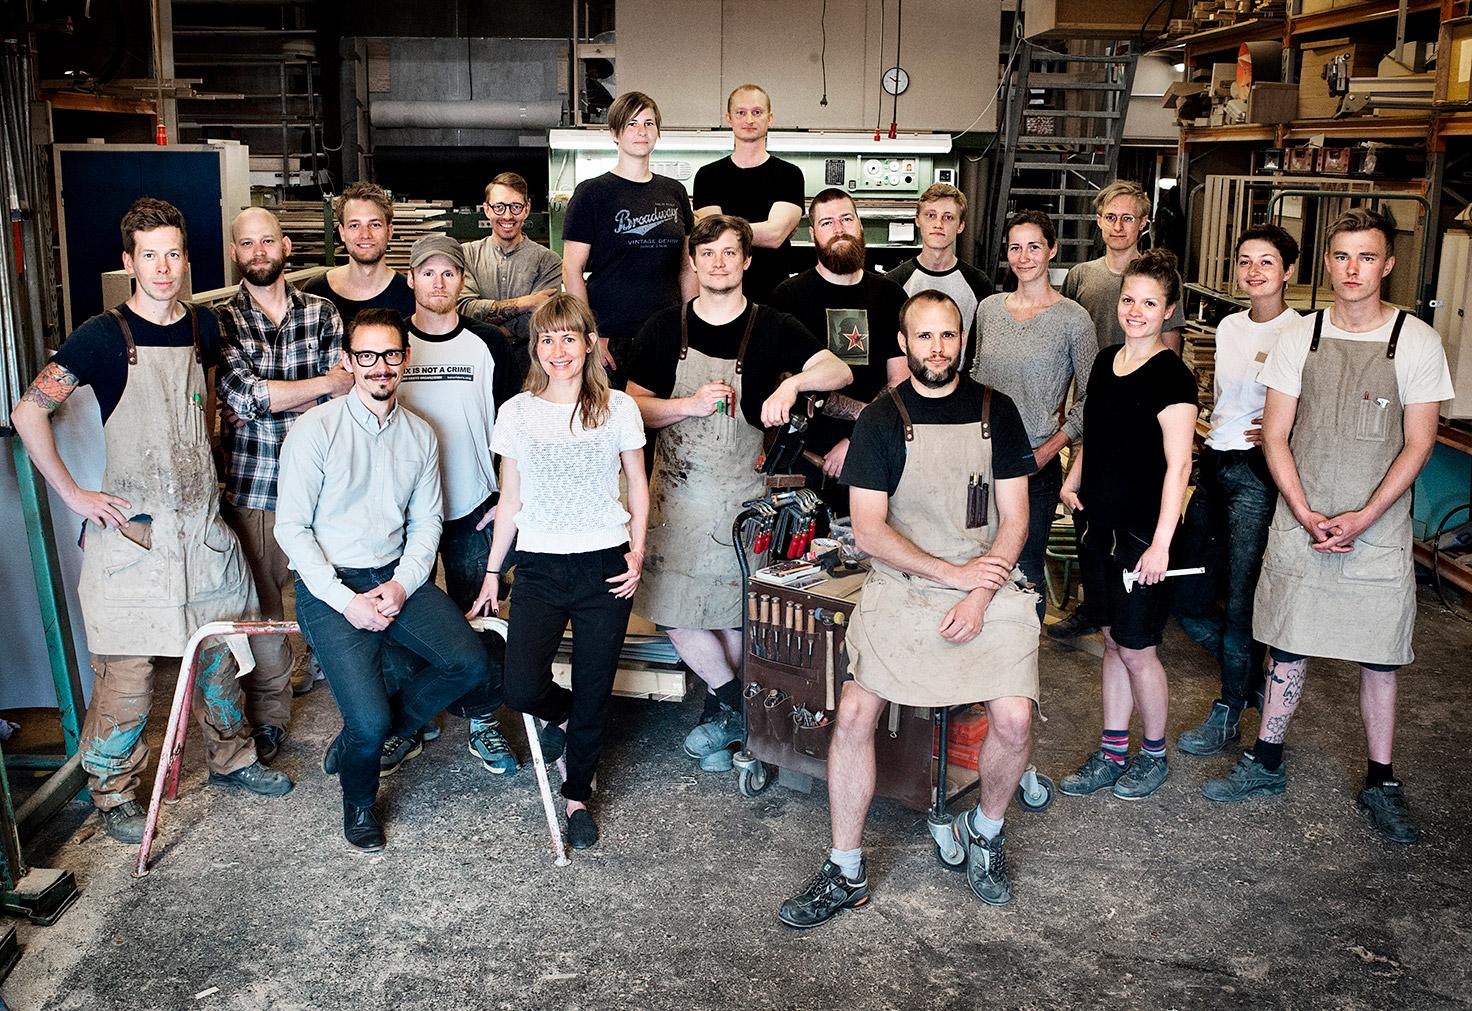 Hele holdet på Teglholmen i København - Nicolaj Bo™